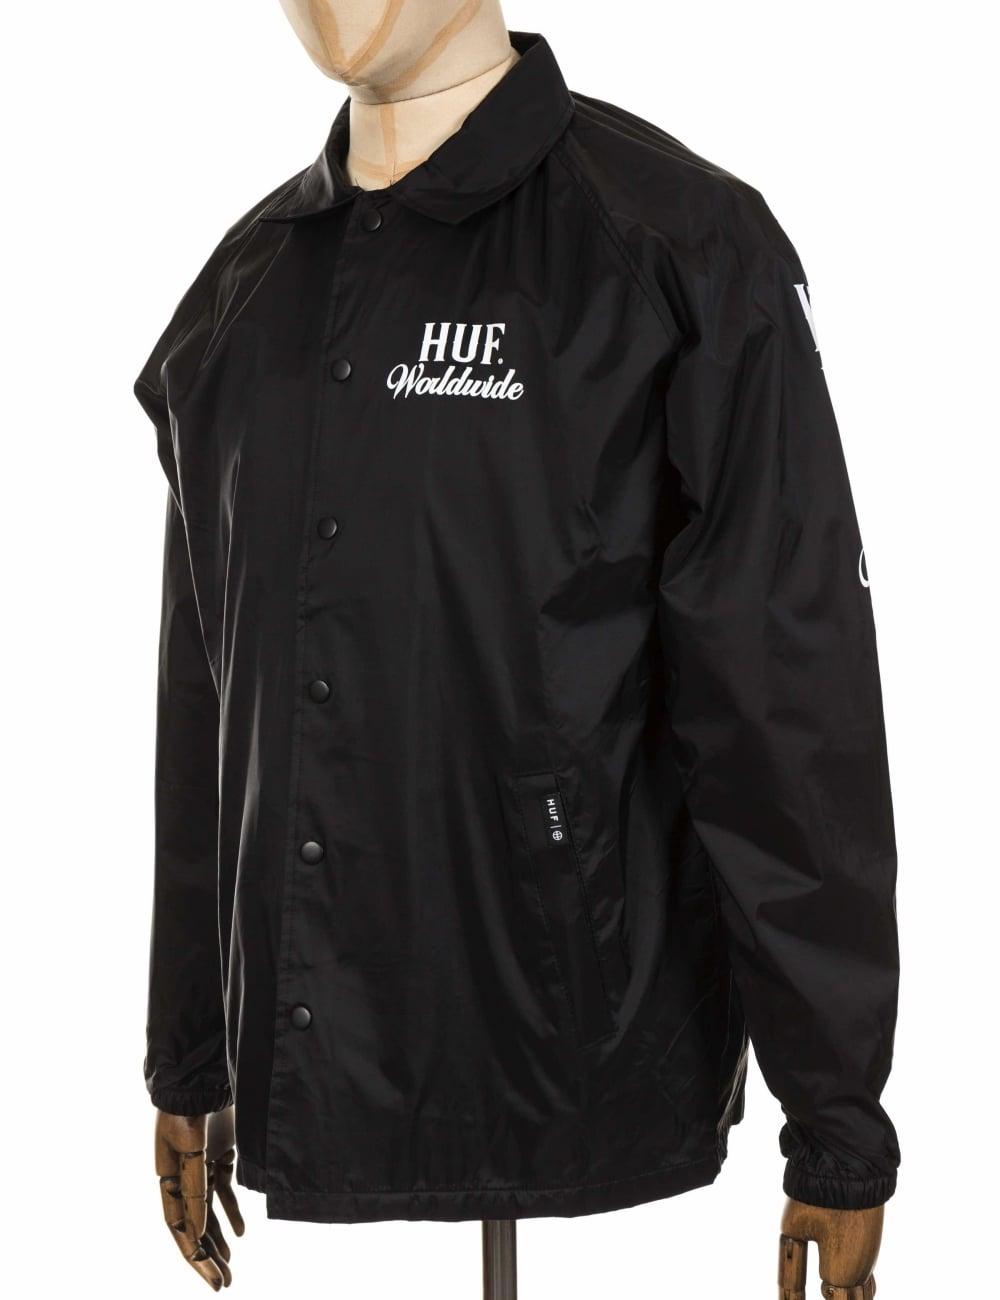 Huf Ultra Coach Jacket Black Clothing From Fat Buddha Store Uk